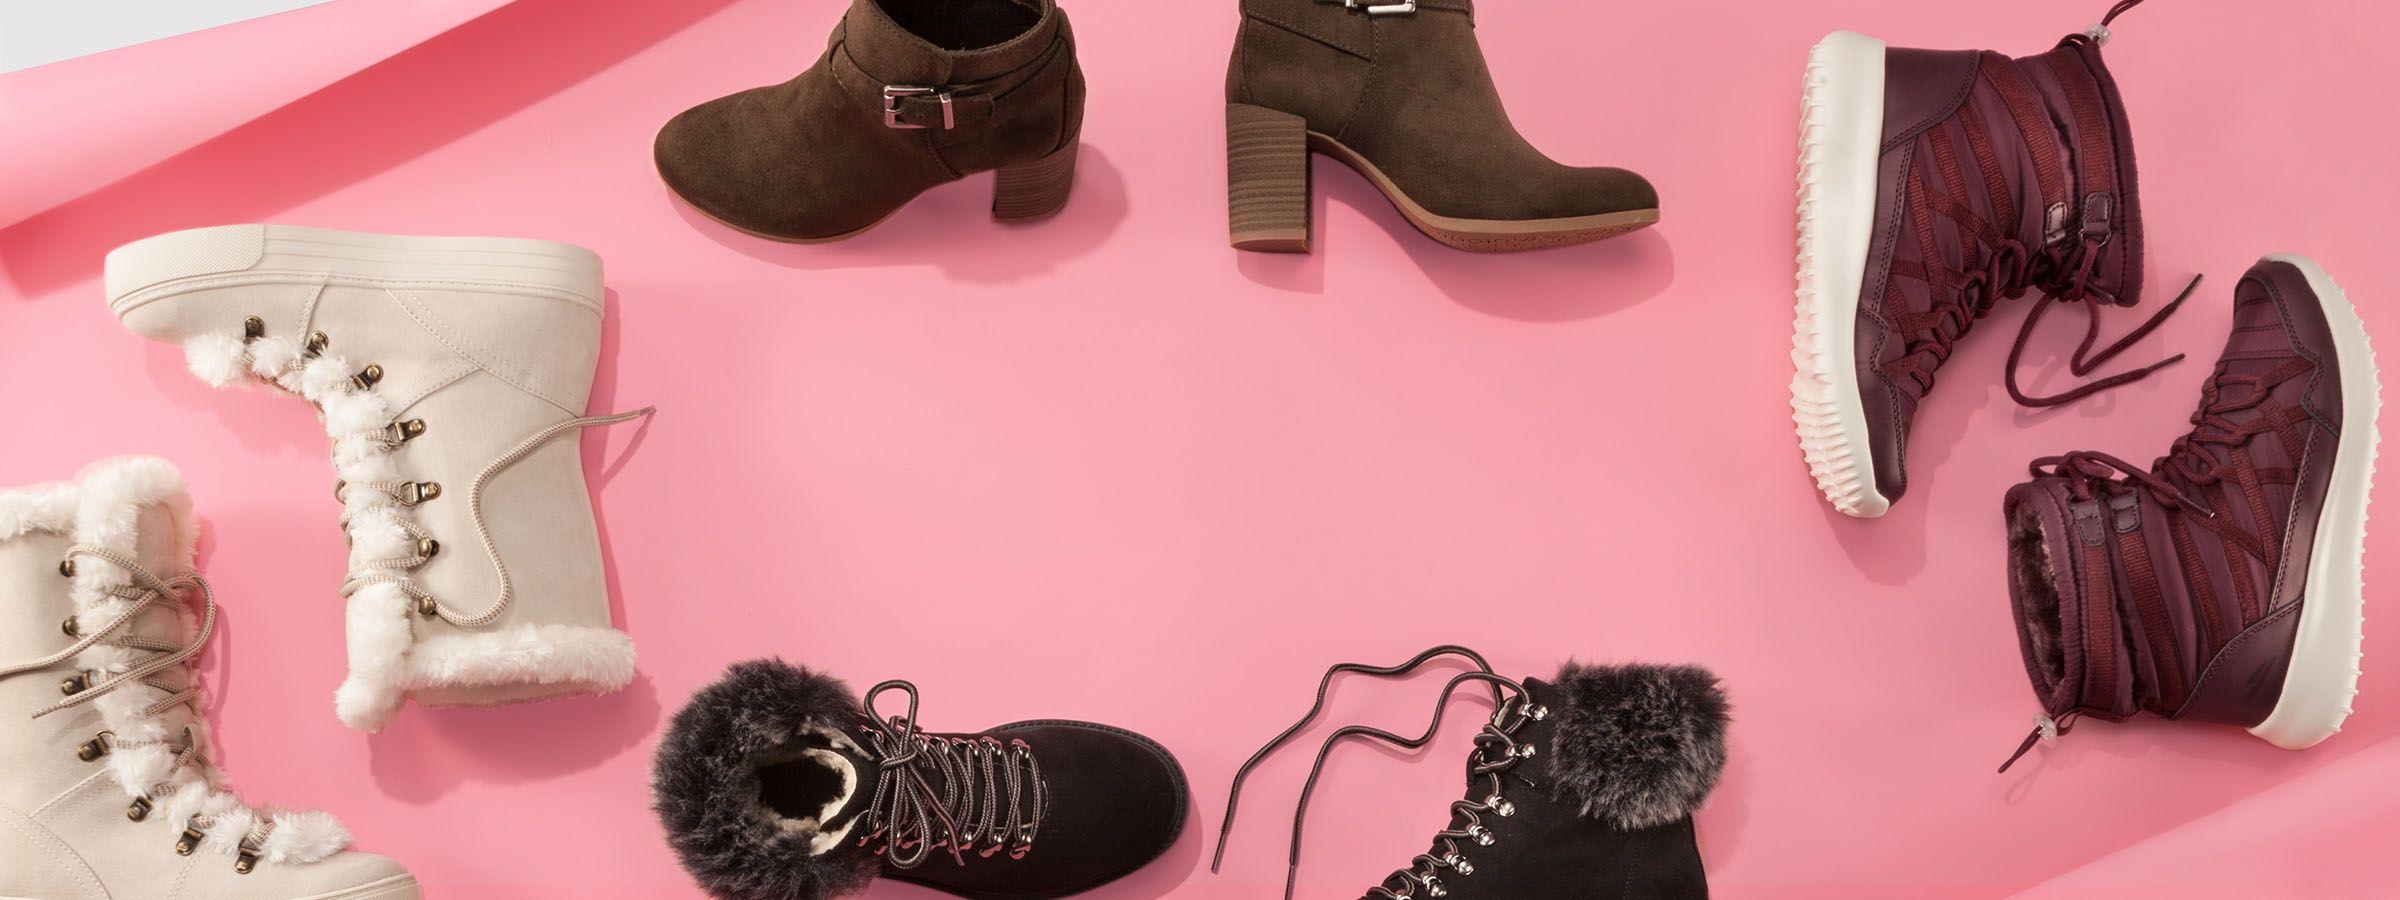 12a57196555 Go cozy-chic. Women s boots